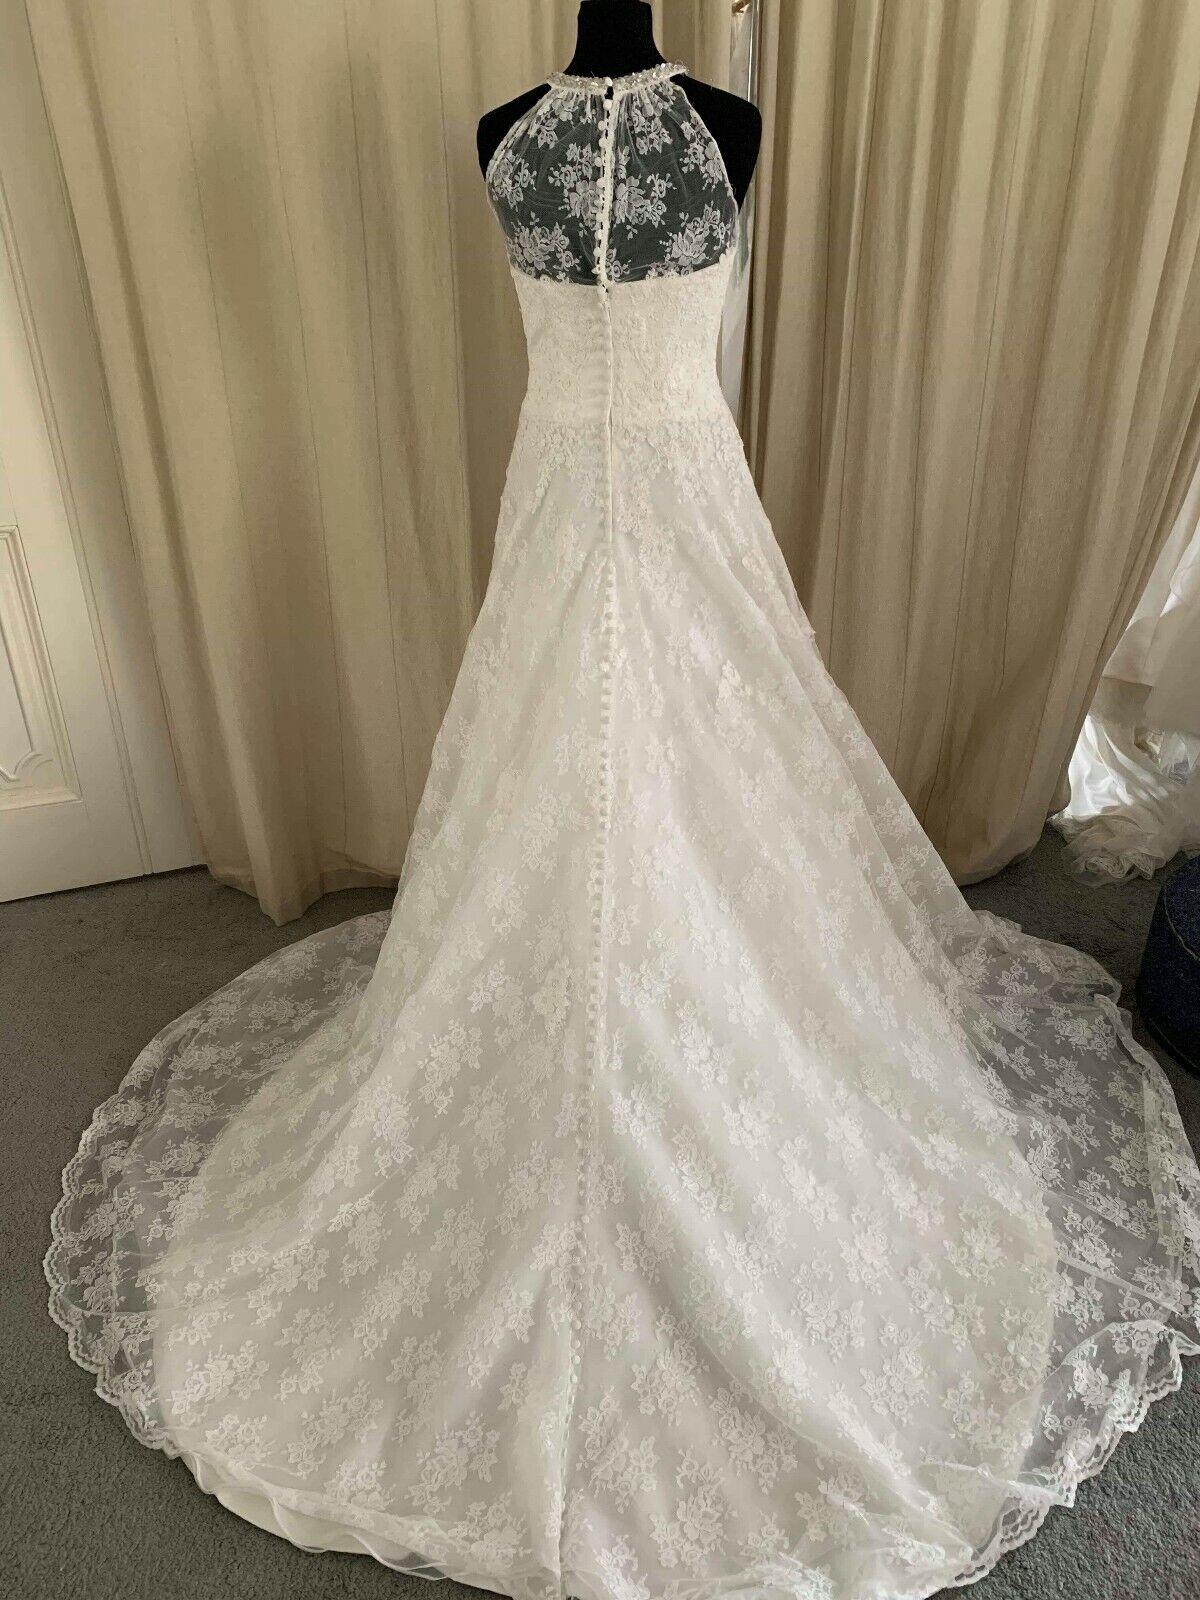 Veromia Wedding Dress ivory lace Size 16 style 61219